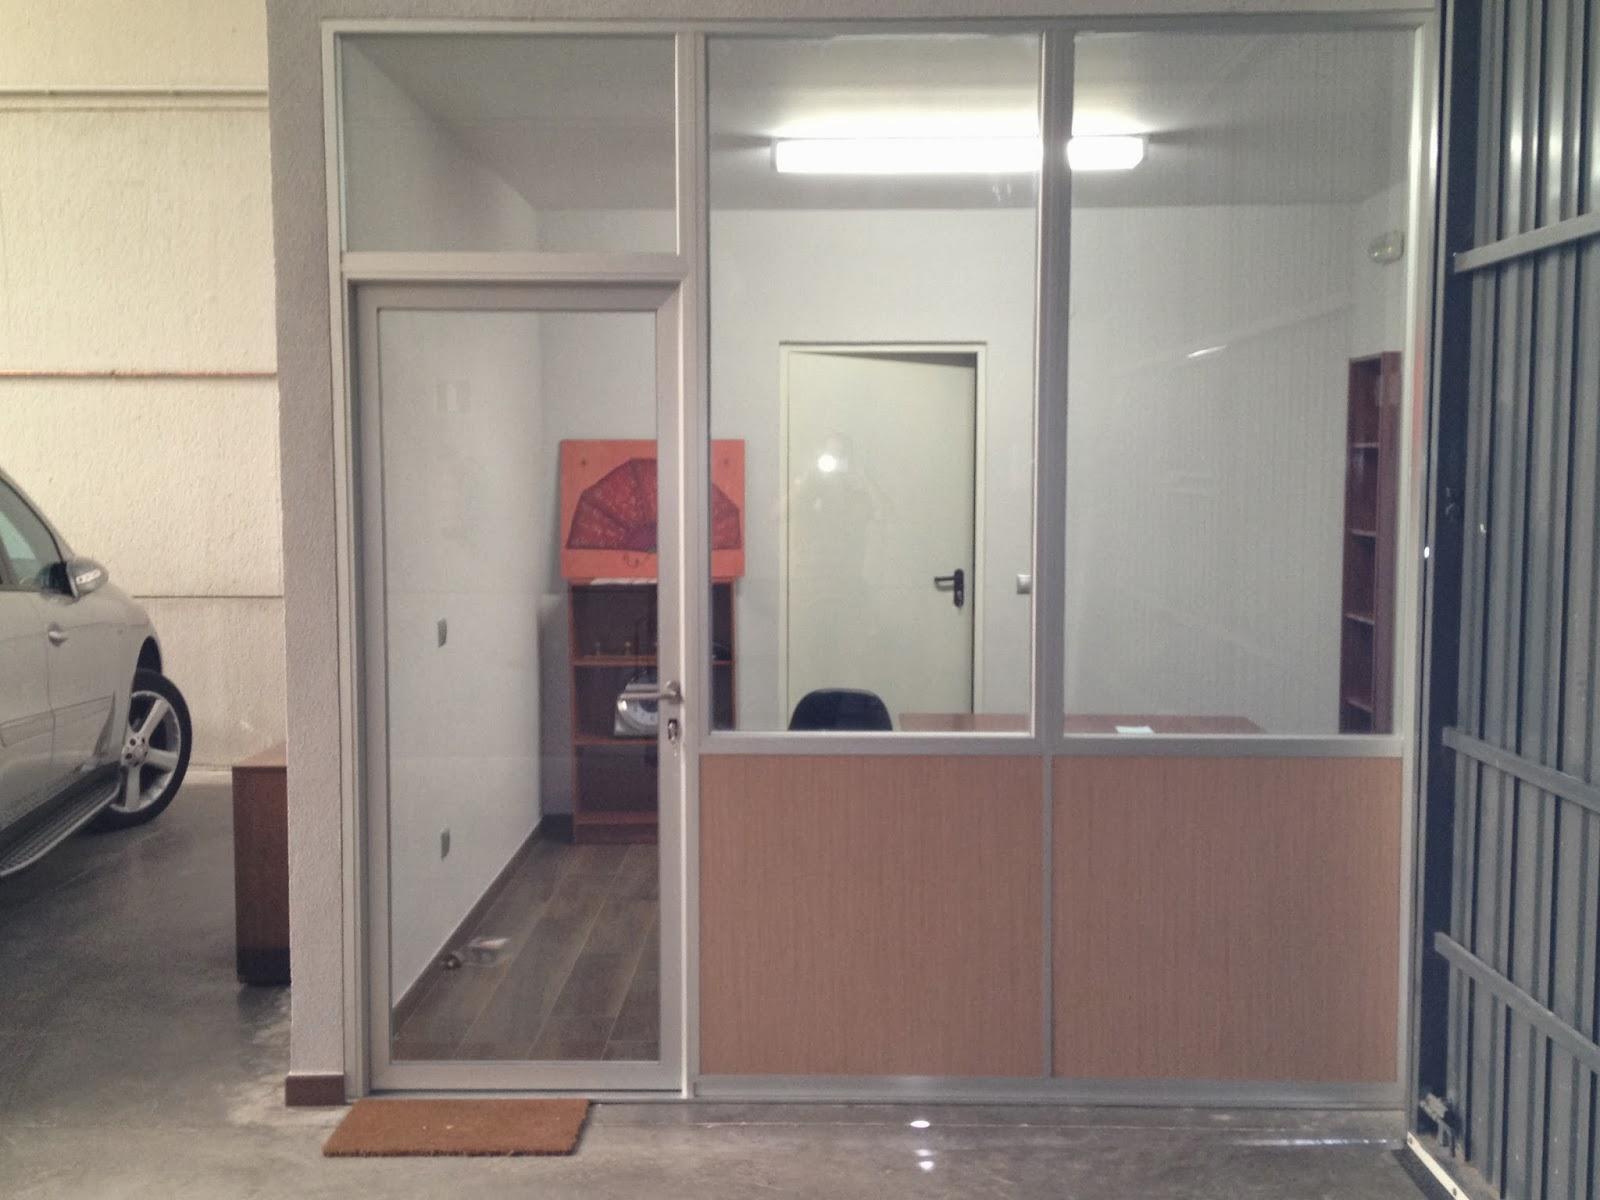 Mamparas de oficina dise o fabricaci n y montaje for Distribucion de oficinas pequenas